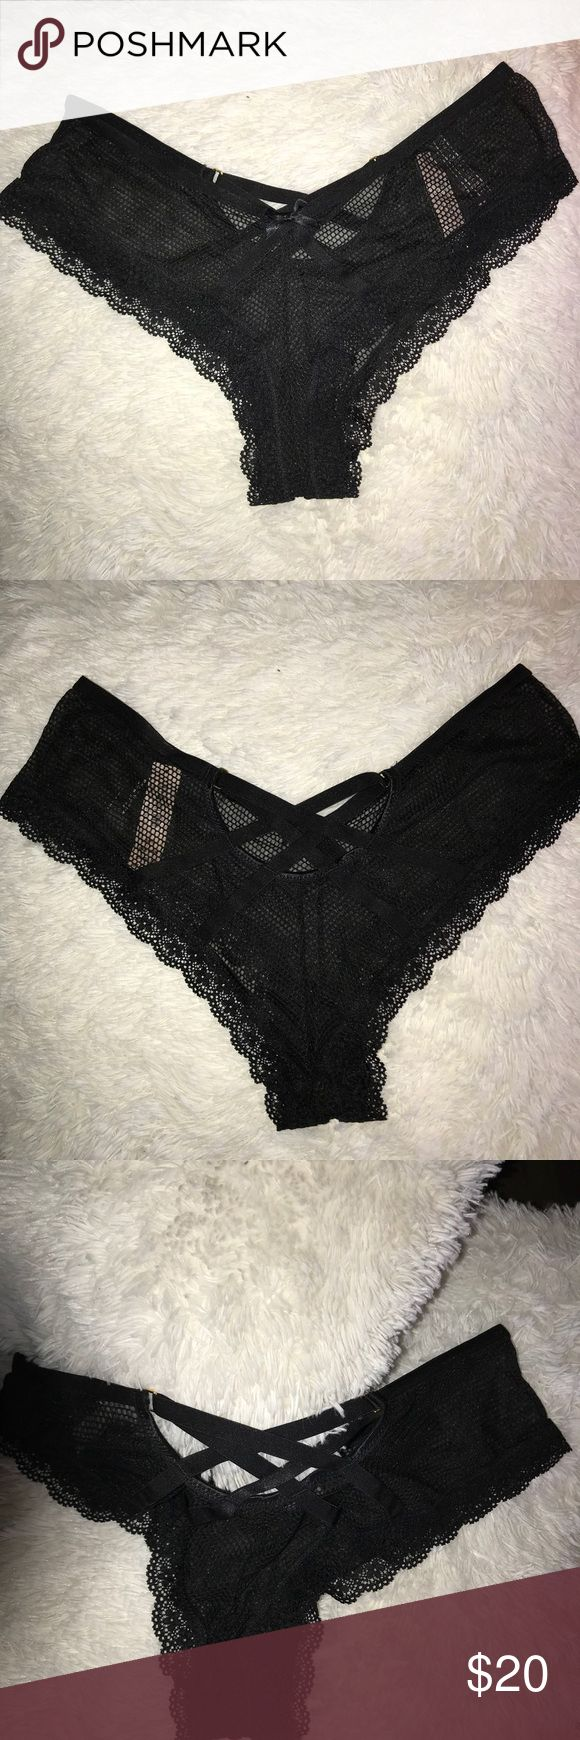 Victoria's Secret Cheeky/Culotte Victoria's Secret Cheeky/Culotte Calvin Klein Intimates & Sleepwear Panties